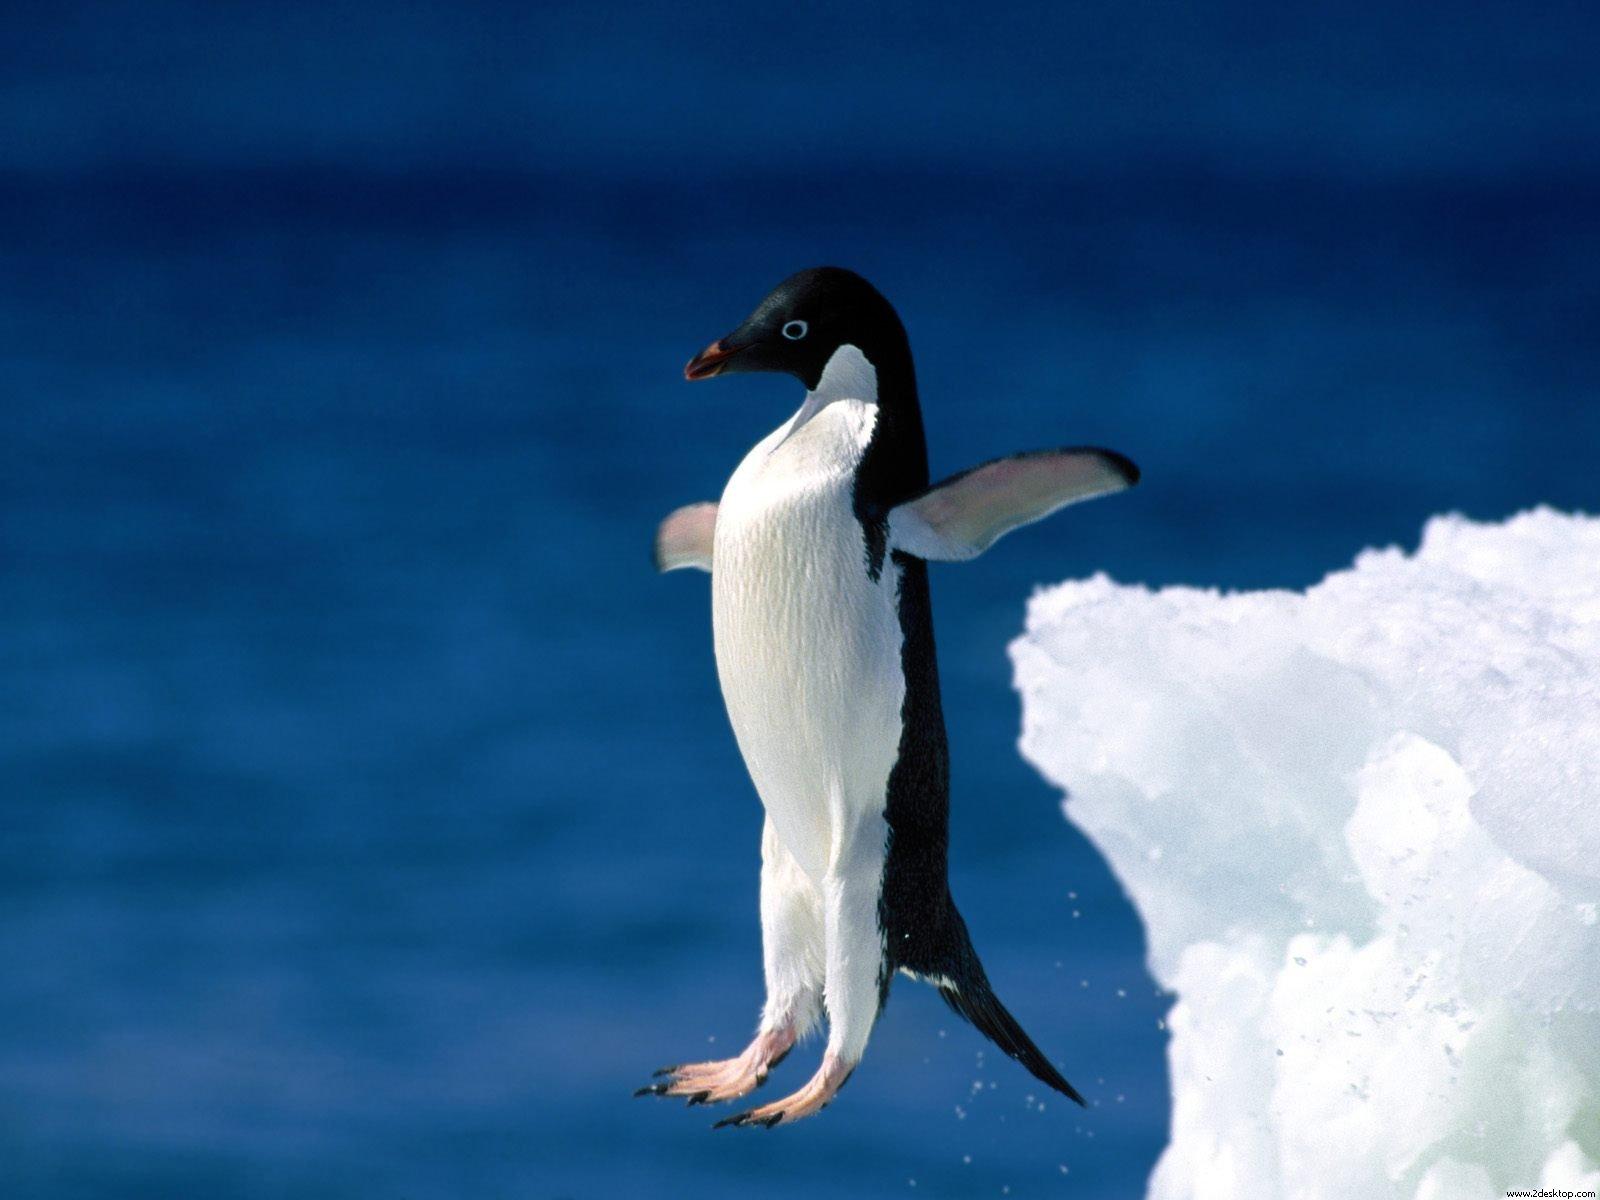 http://4.bp.blogspot.com/-OQk5CRPHAxA/T_5OYa5Uf3I/AAAAAAAAGTU/dWVCb9gZZ8Q/s1600/penguin+wallpaper+hd-4.jpg